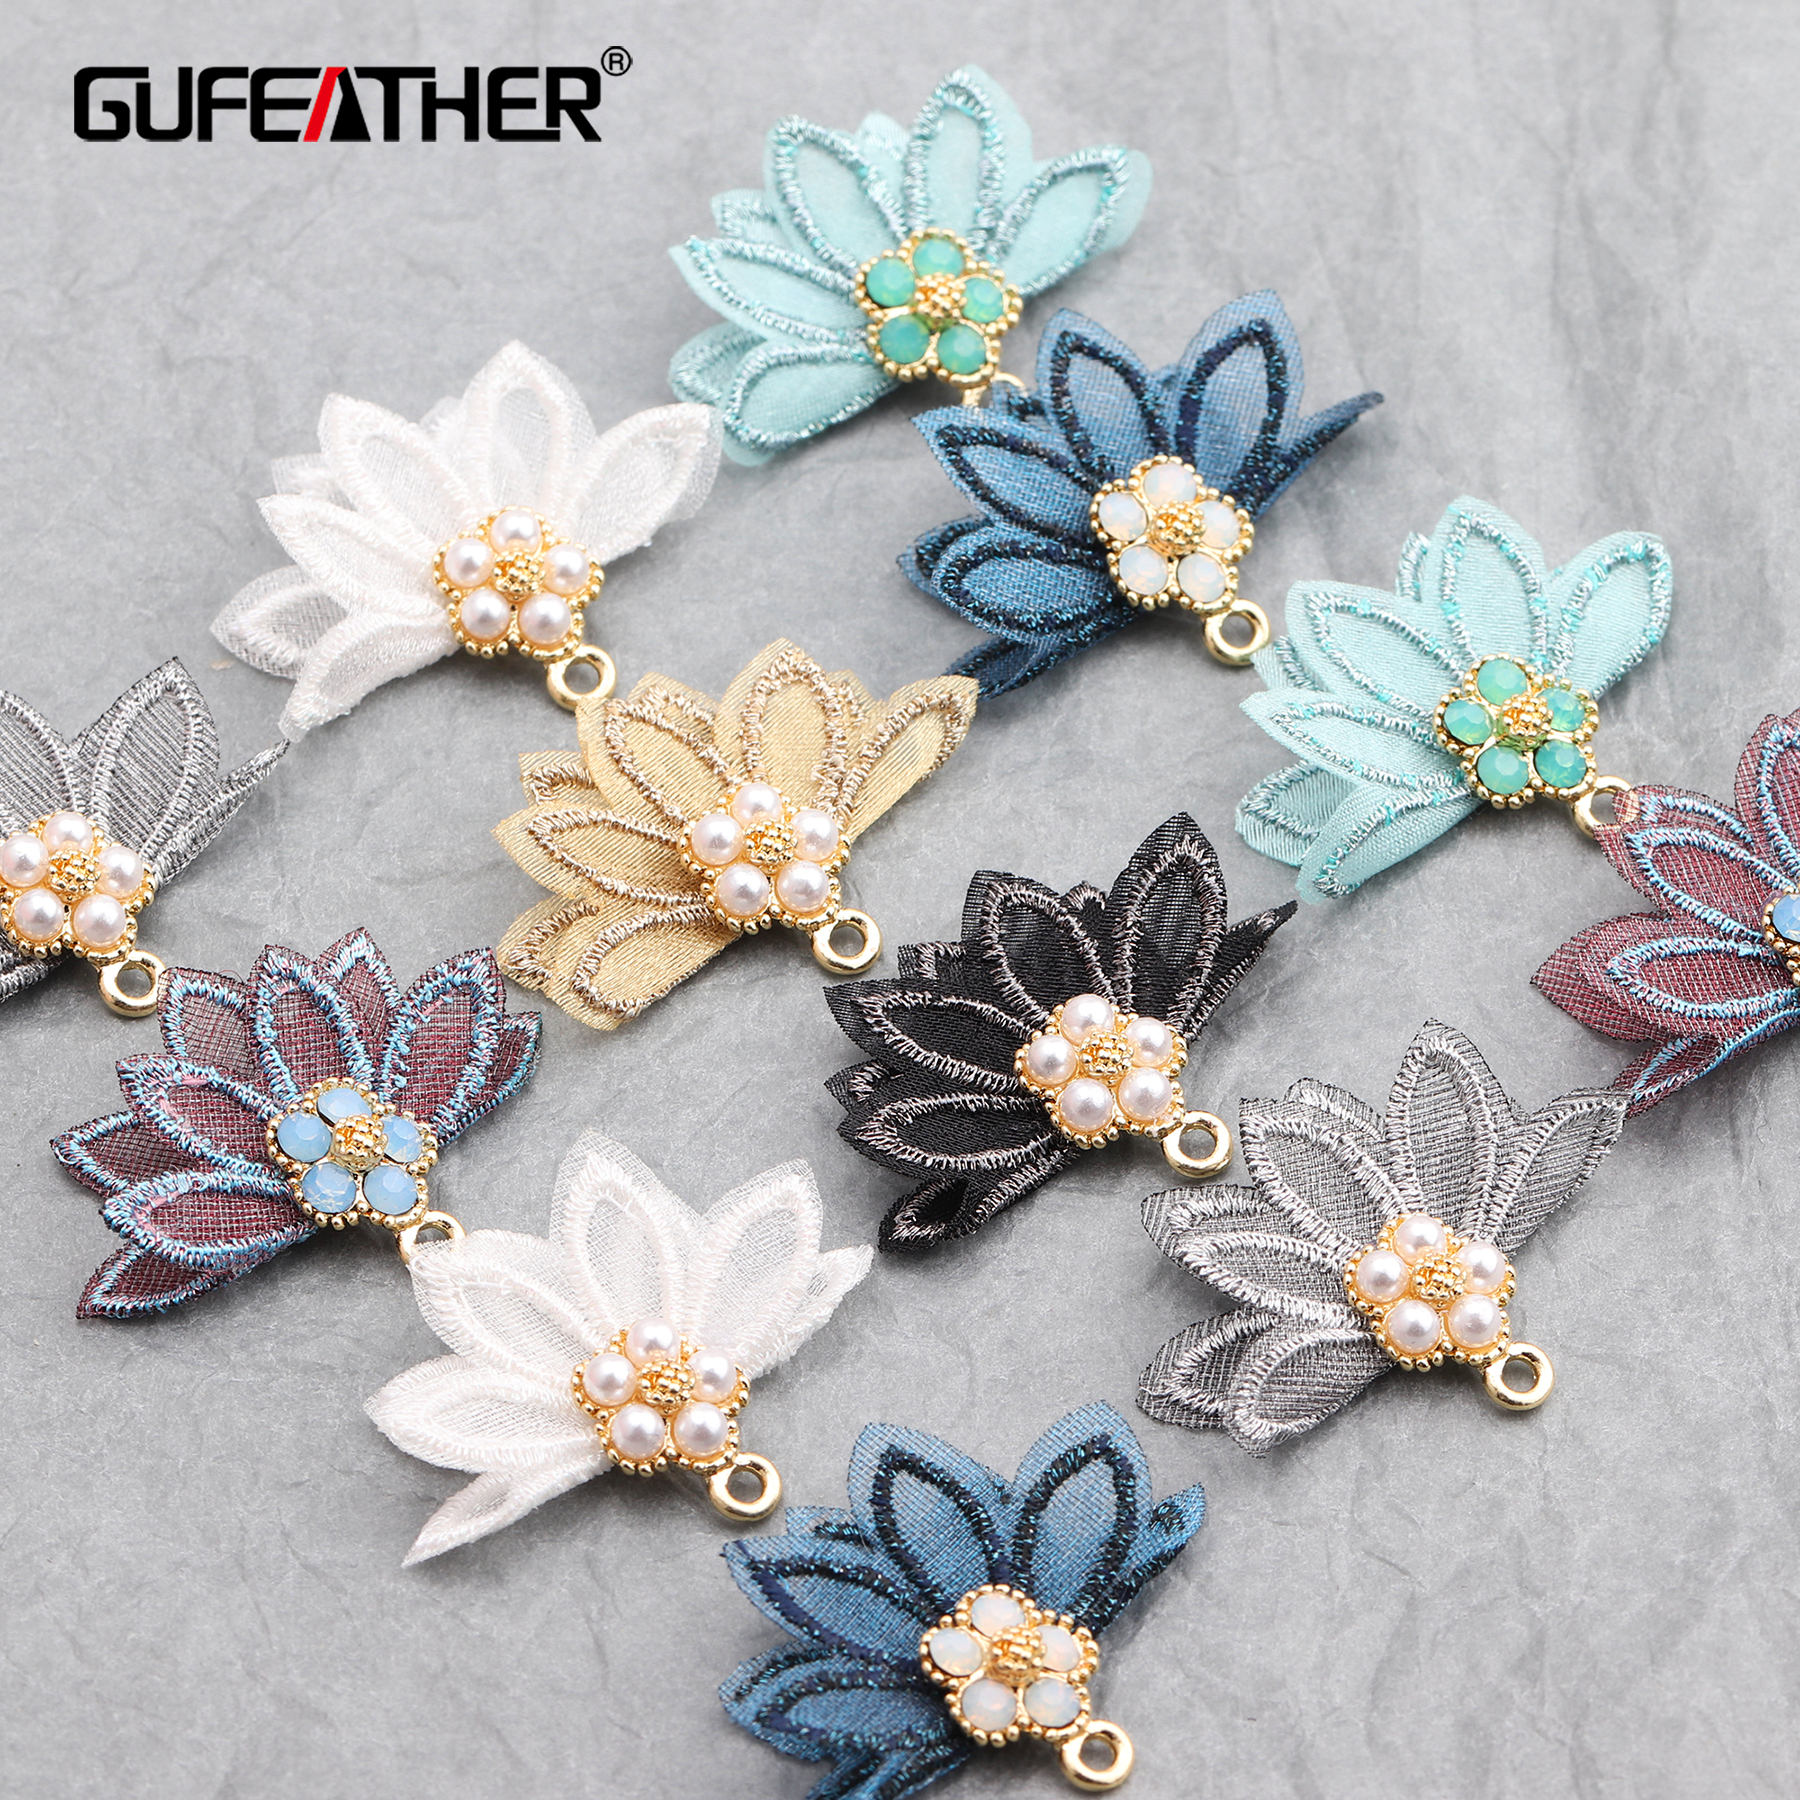 GUFEATHER M597,jewelry Accessories,tassels,flower,diy Pendant,jewelry Findings,hand Made,jewelry Making,diy Earrings,10pcs/lot